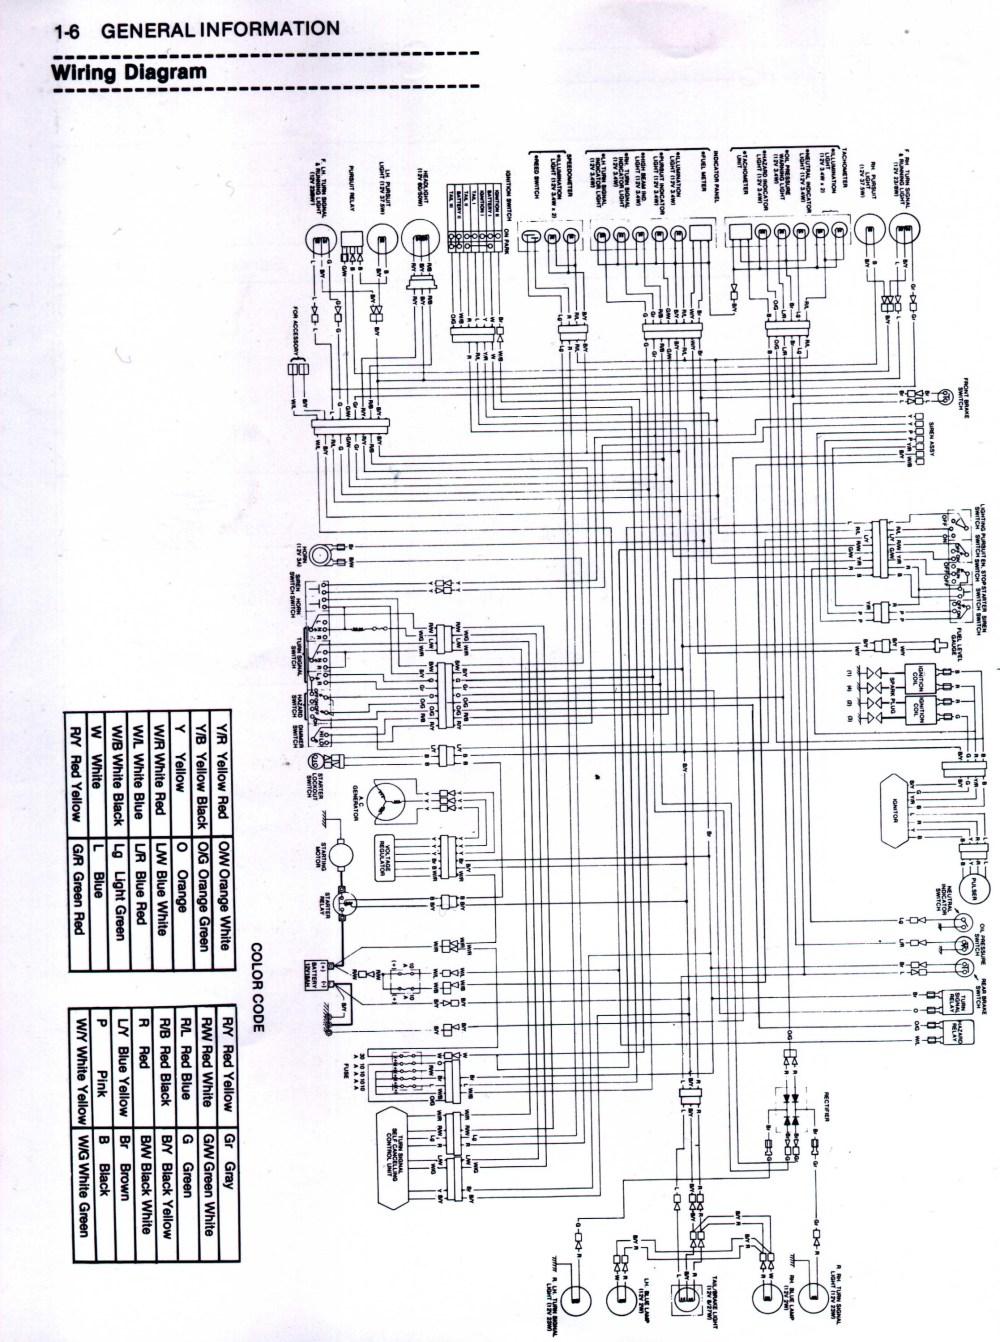 medium resolution of roadstar wiring diagram schematic diagramfree download roadstar ii wiring diagram wiring diagram electrical wiring free download